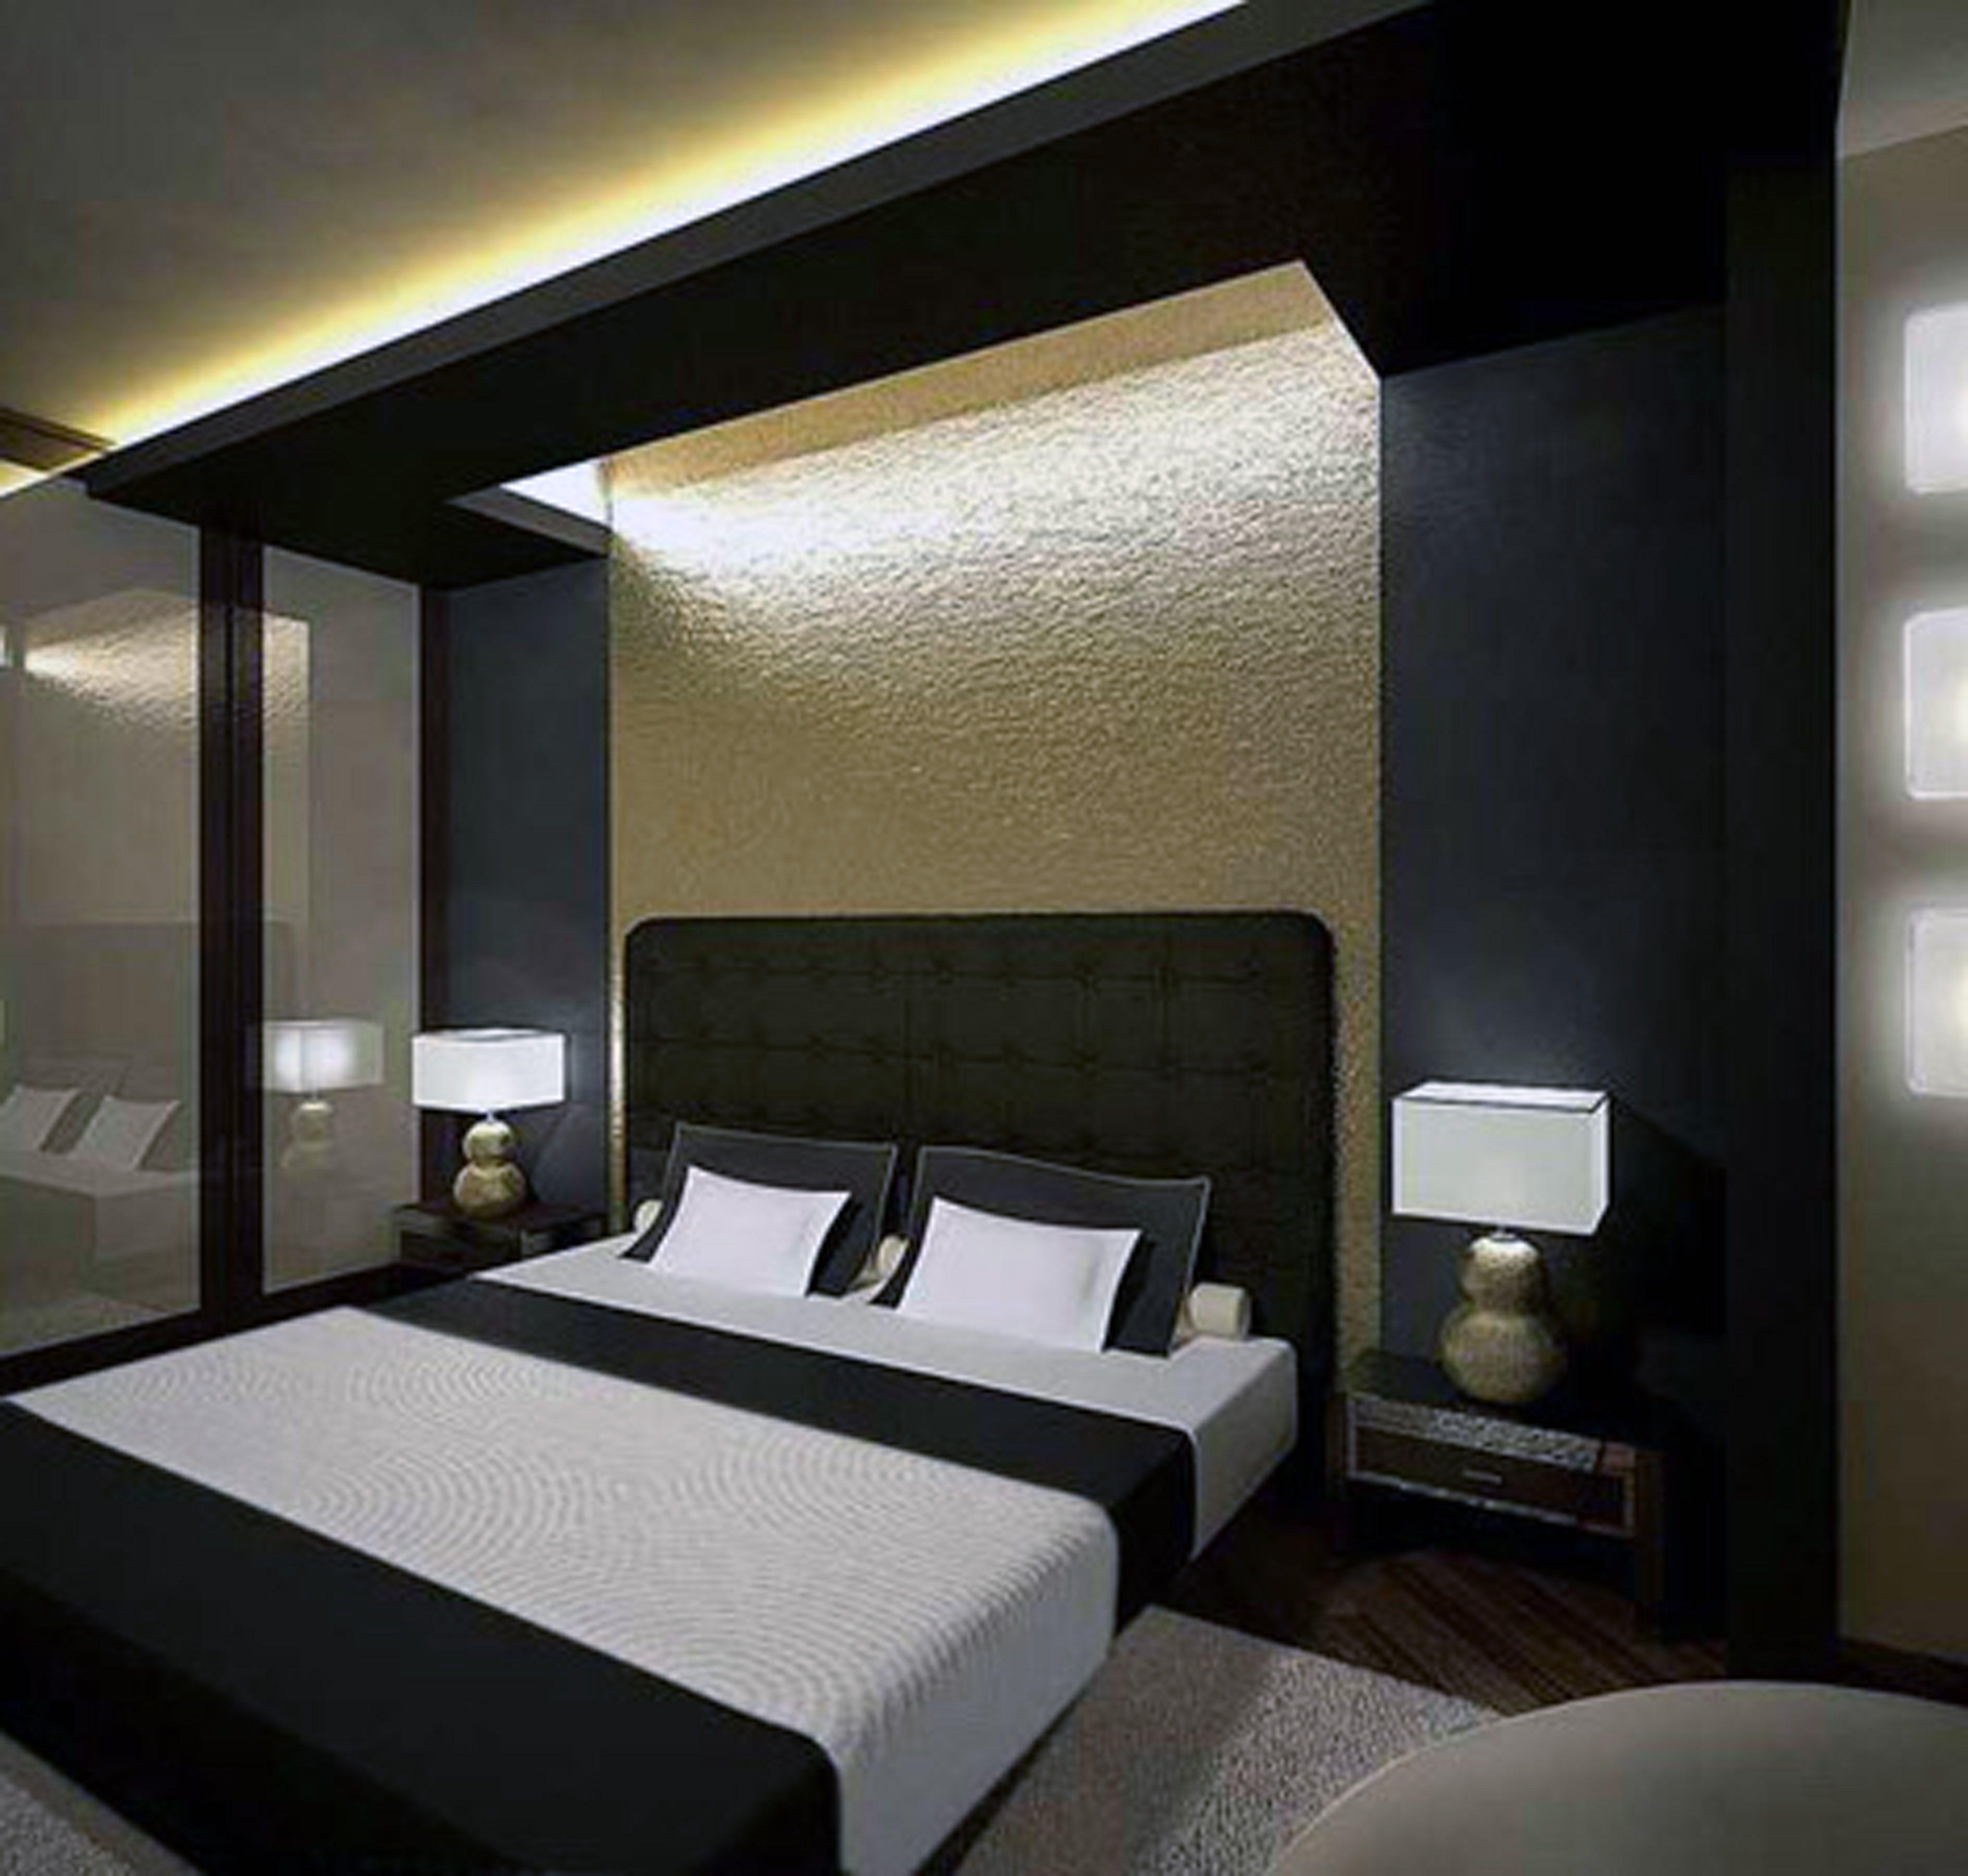 Bedroom Interior Design Photos Photo Design Bed Bedroom Modern